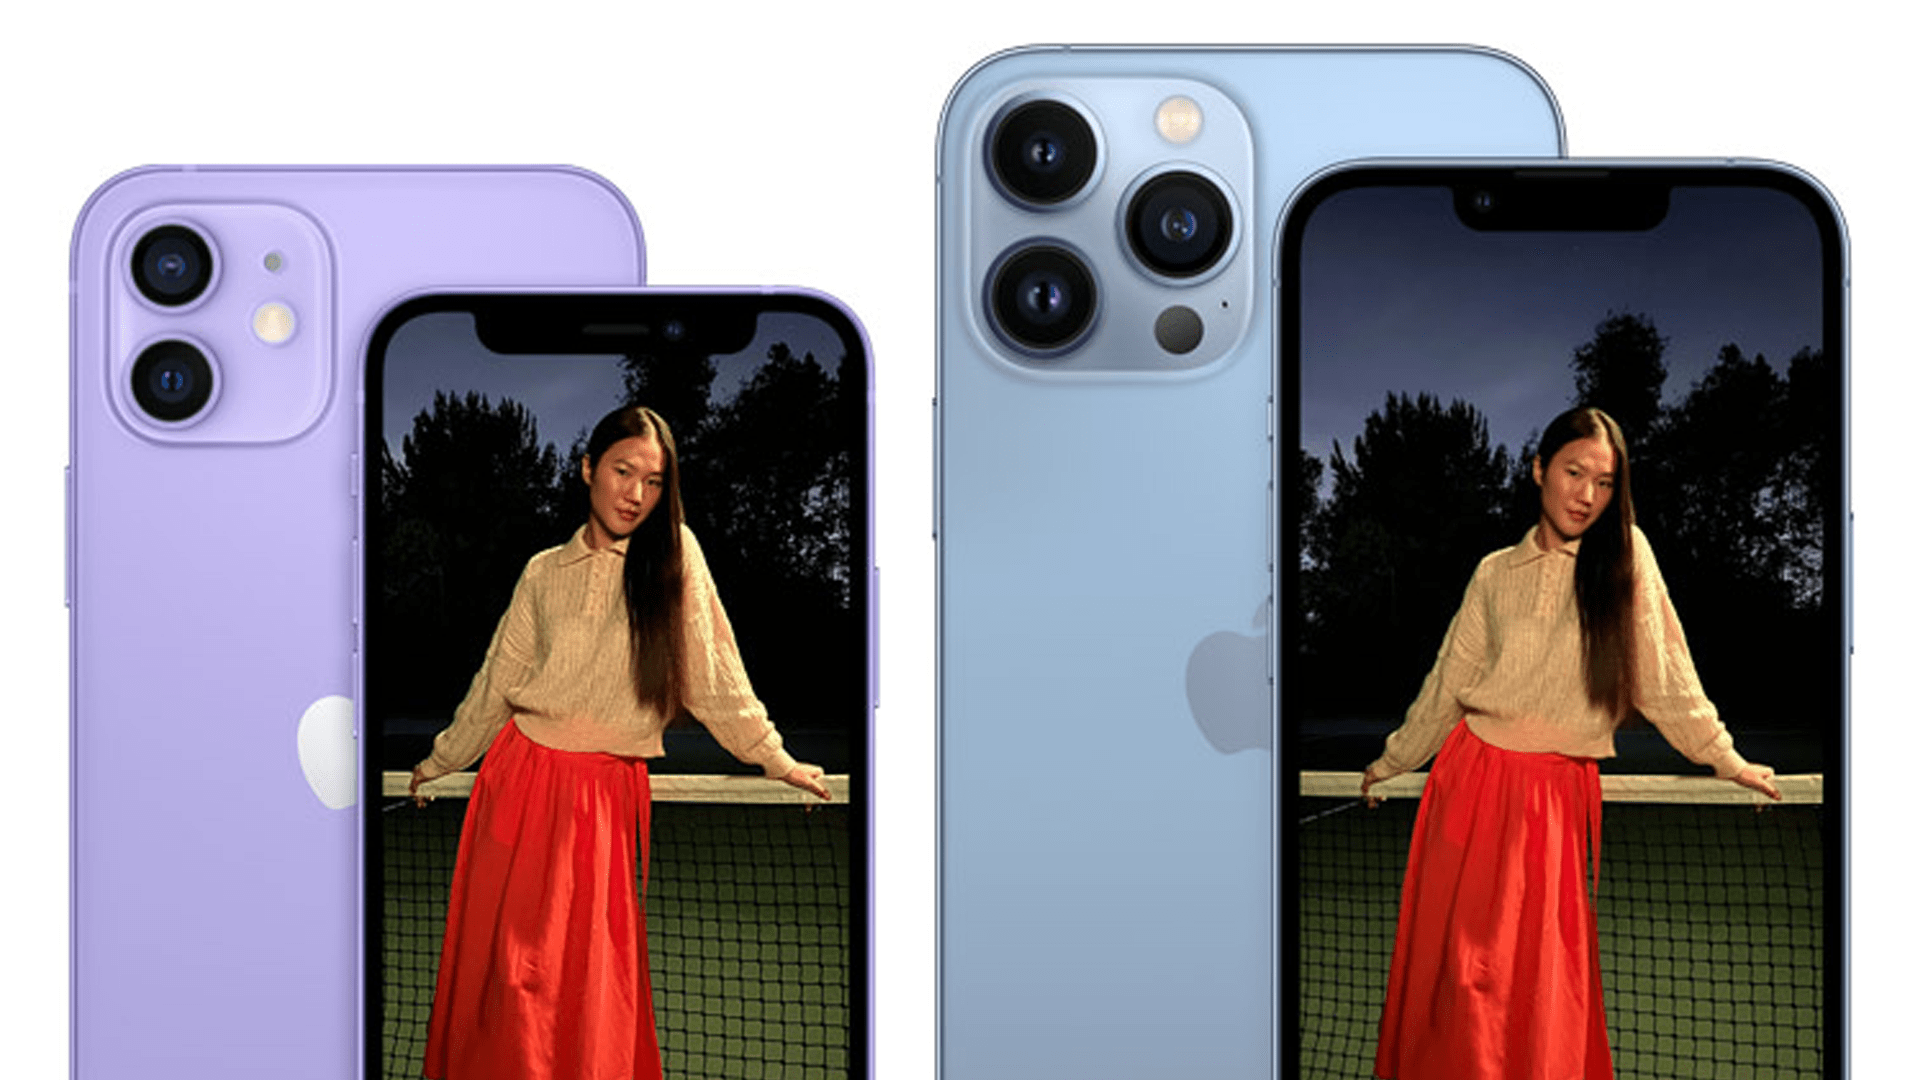 Smartphone, Iphone, Cpu, Launch, Kamera, SoC, Arm, Preis, Verfügbarkeit, Termin, HDR, Hexacore, iPhone 13, iPhone 13 Pro, iPhone 13 Mini, Apple A15, iPhone 13 Pro Max, Apple A15 Bionic